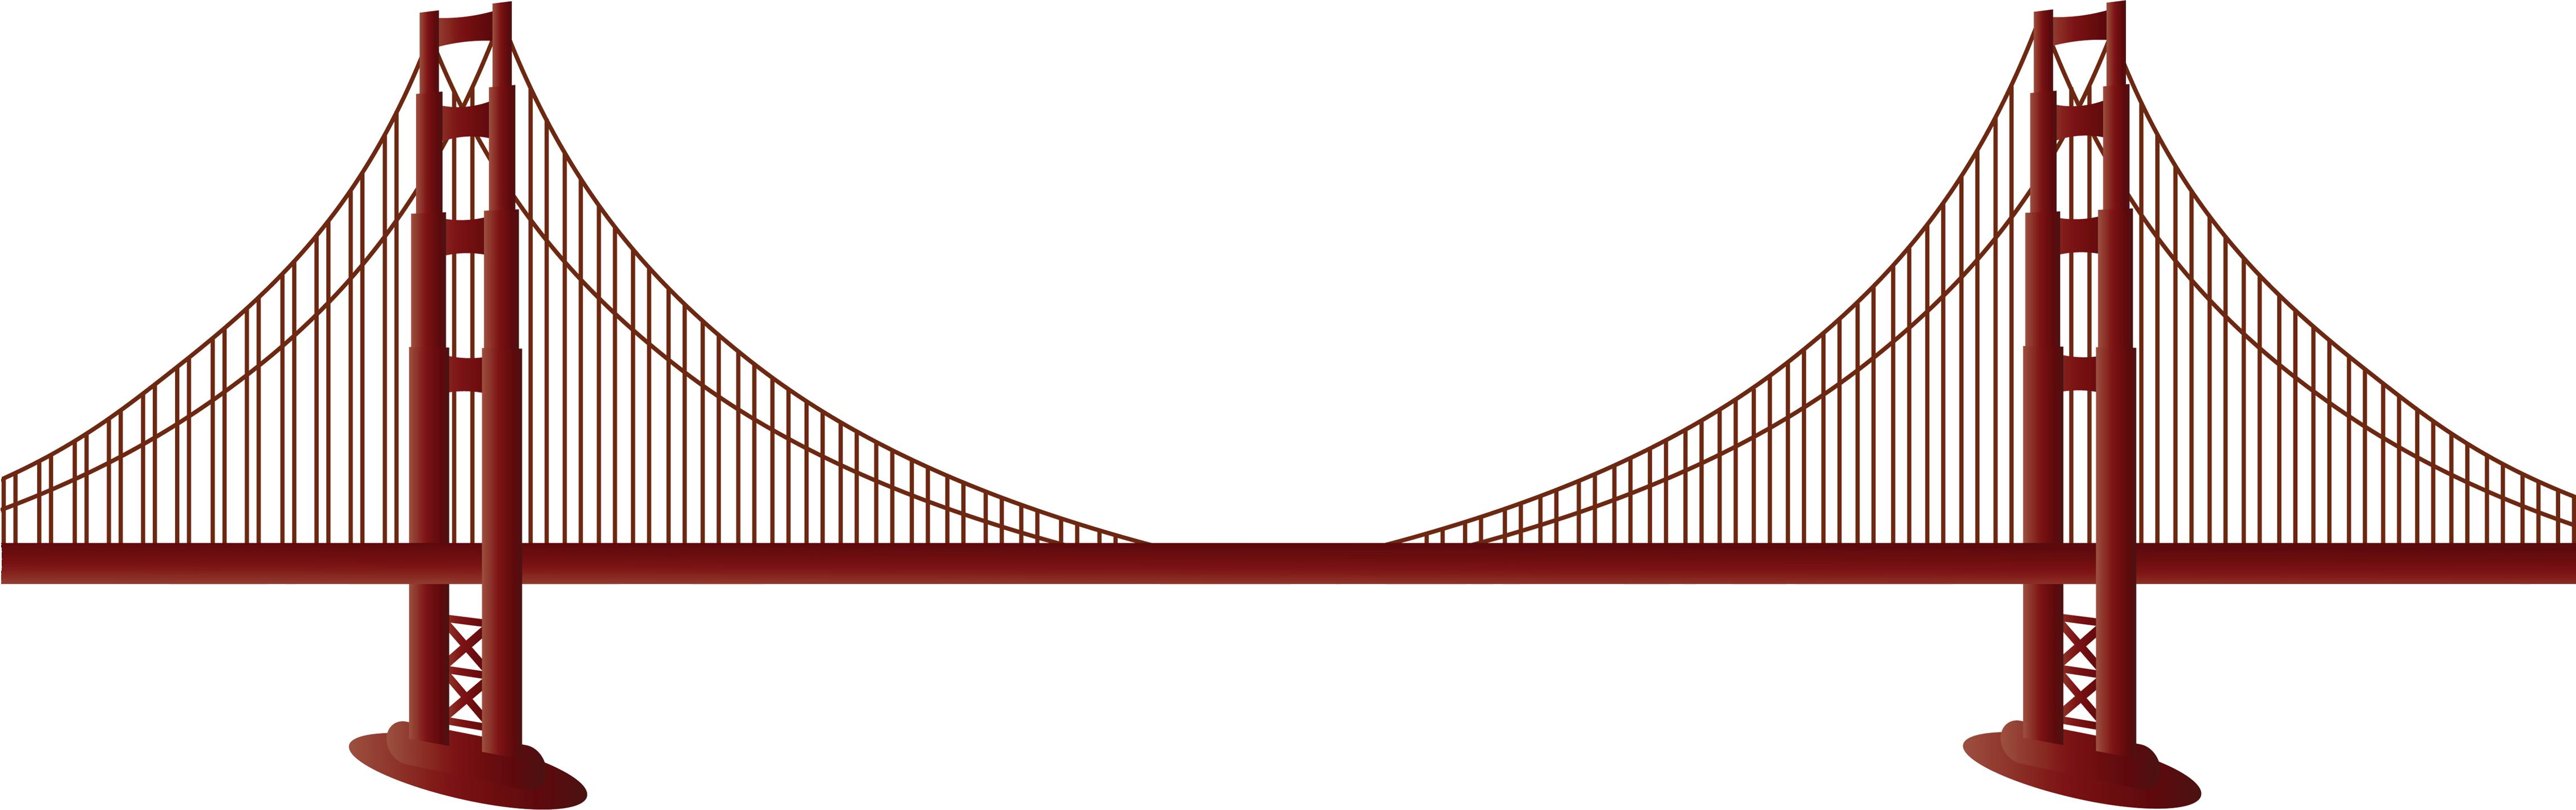 Golden Gate Bridge Palace of Fine Arts Theatre San Francisco cable ... freeuse